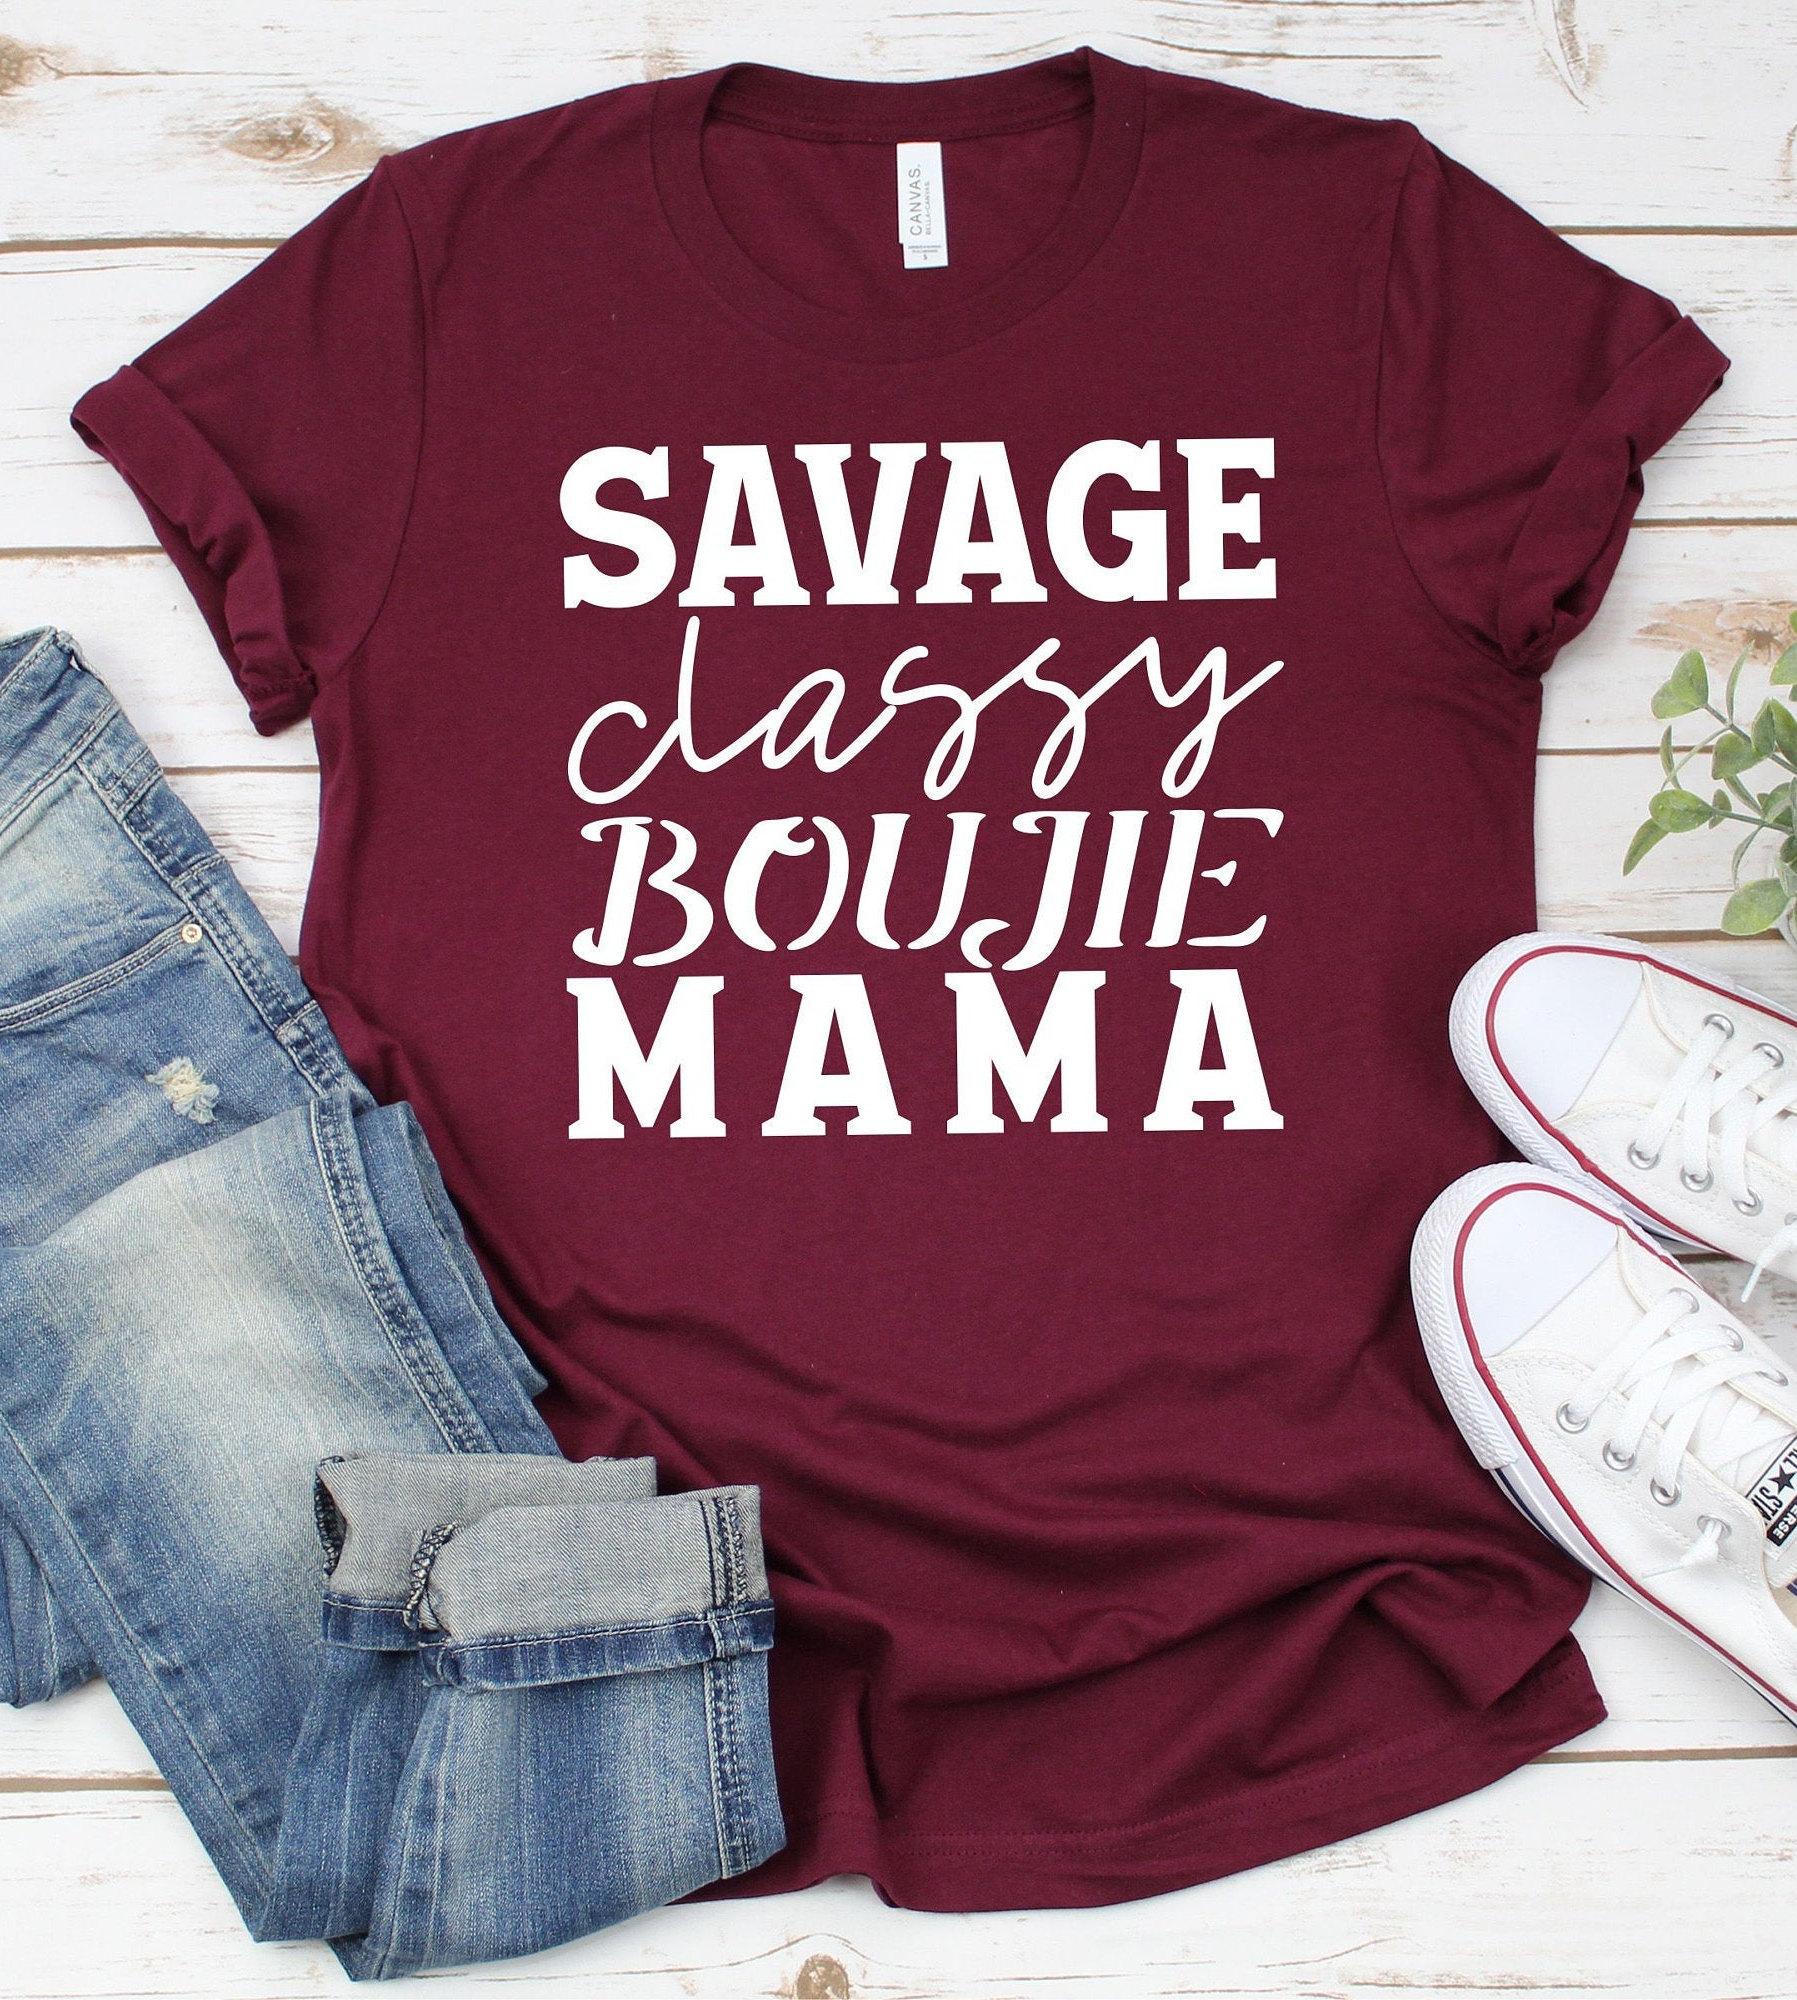 Mothers-day-svg-savage-classy-mama-svg-savage-svg-boujie-svgmama-svg-design-new-svg-designs-cuttable-svg-design-valentine-cricut-svg-60512b87